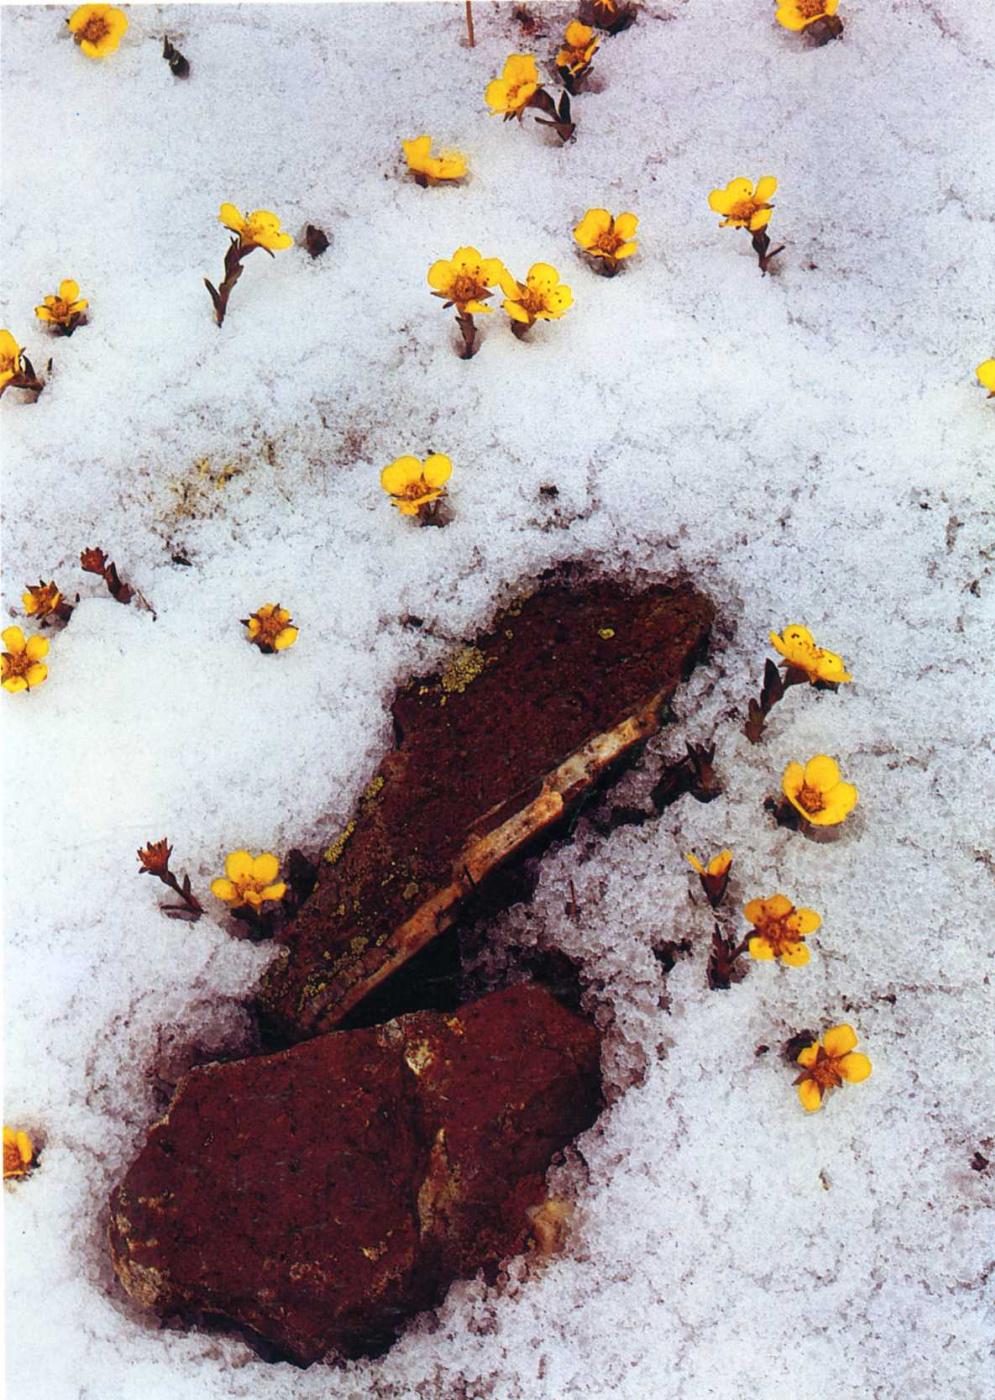 David Munich. Flowers in the snow